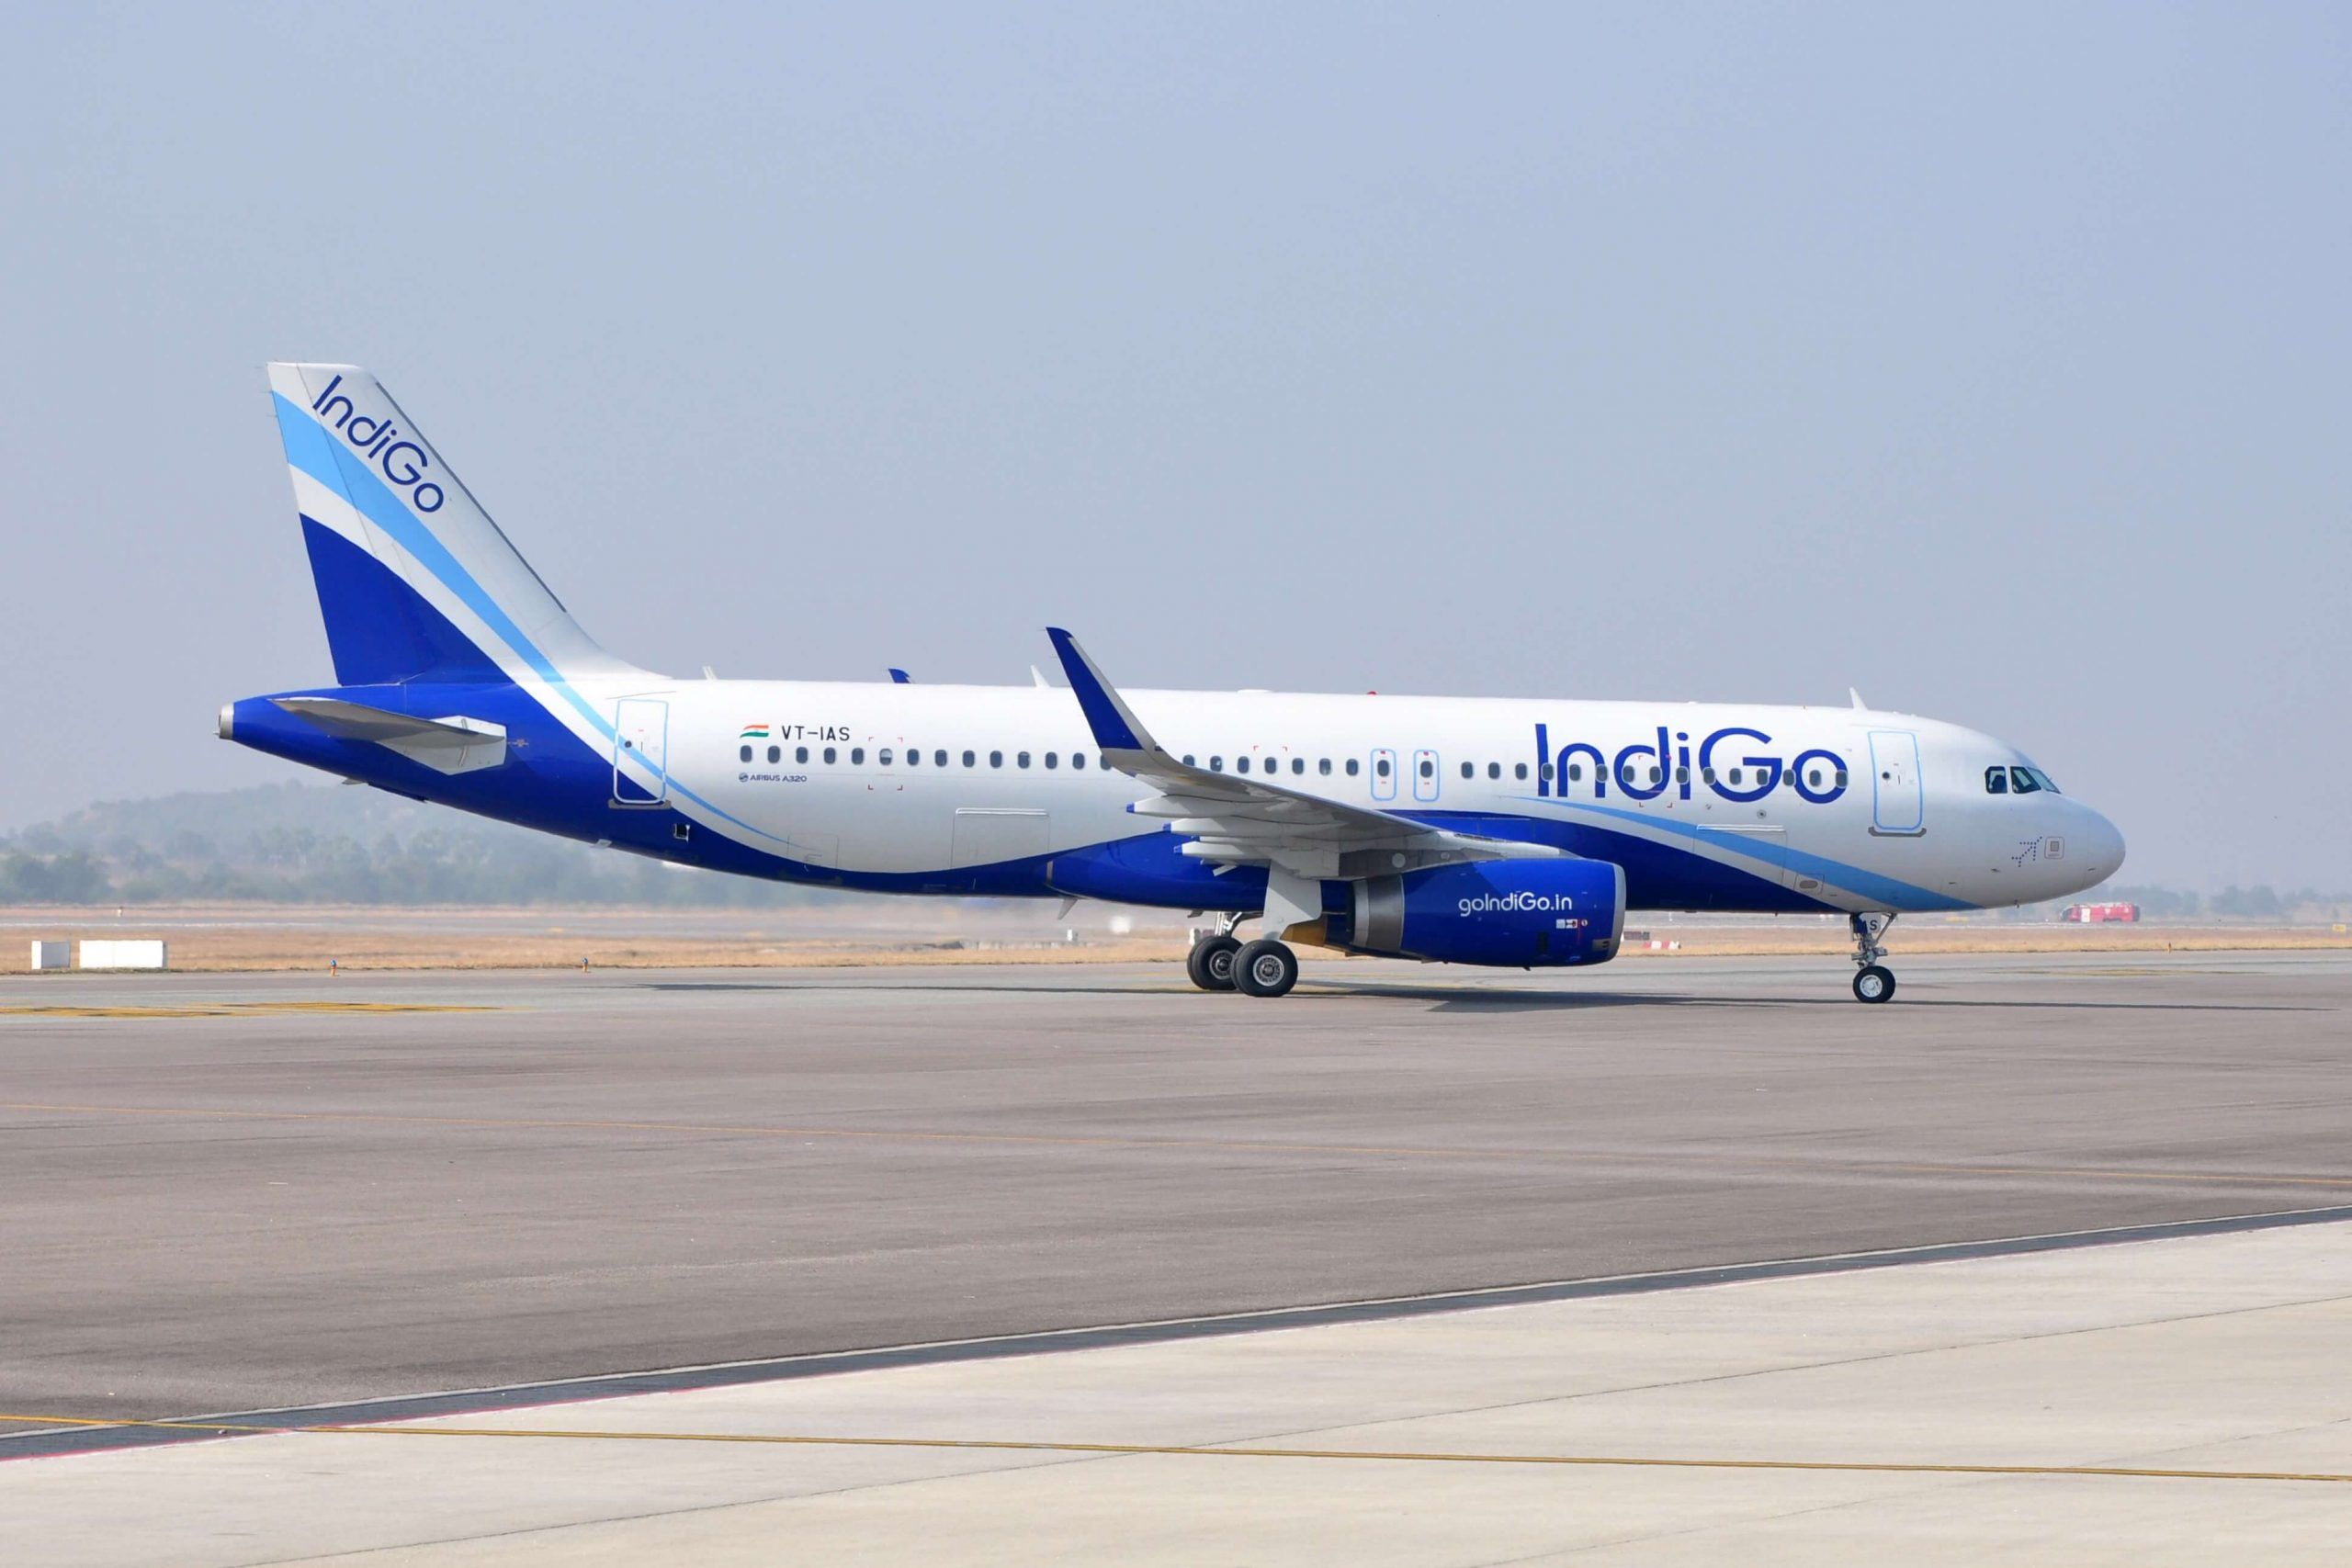 IndiGo adds new Indian destination from Qatar